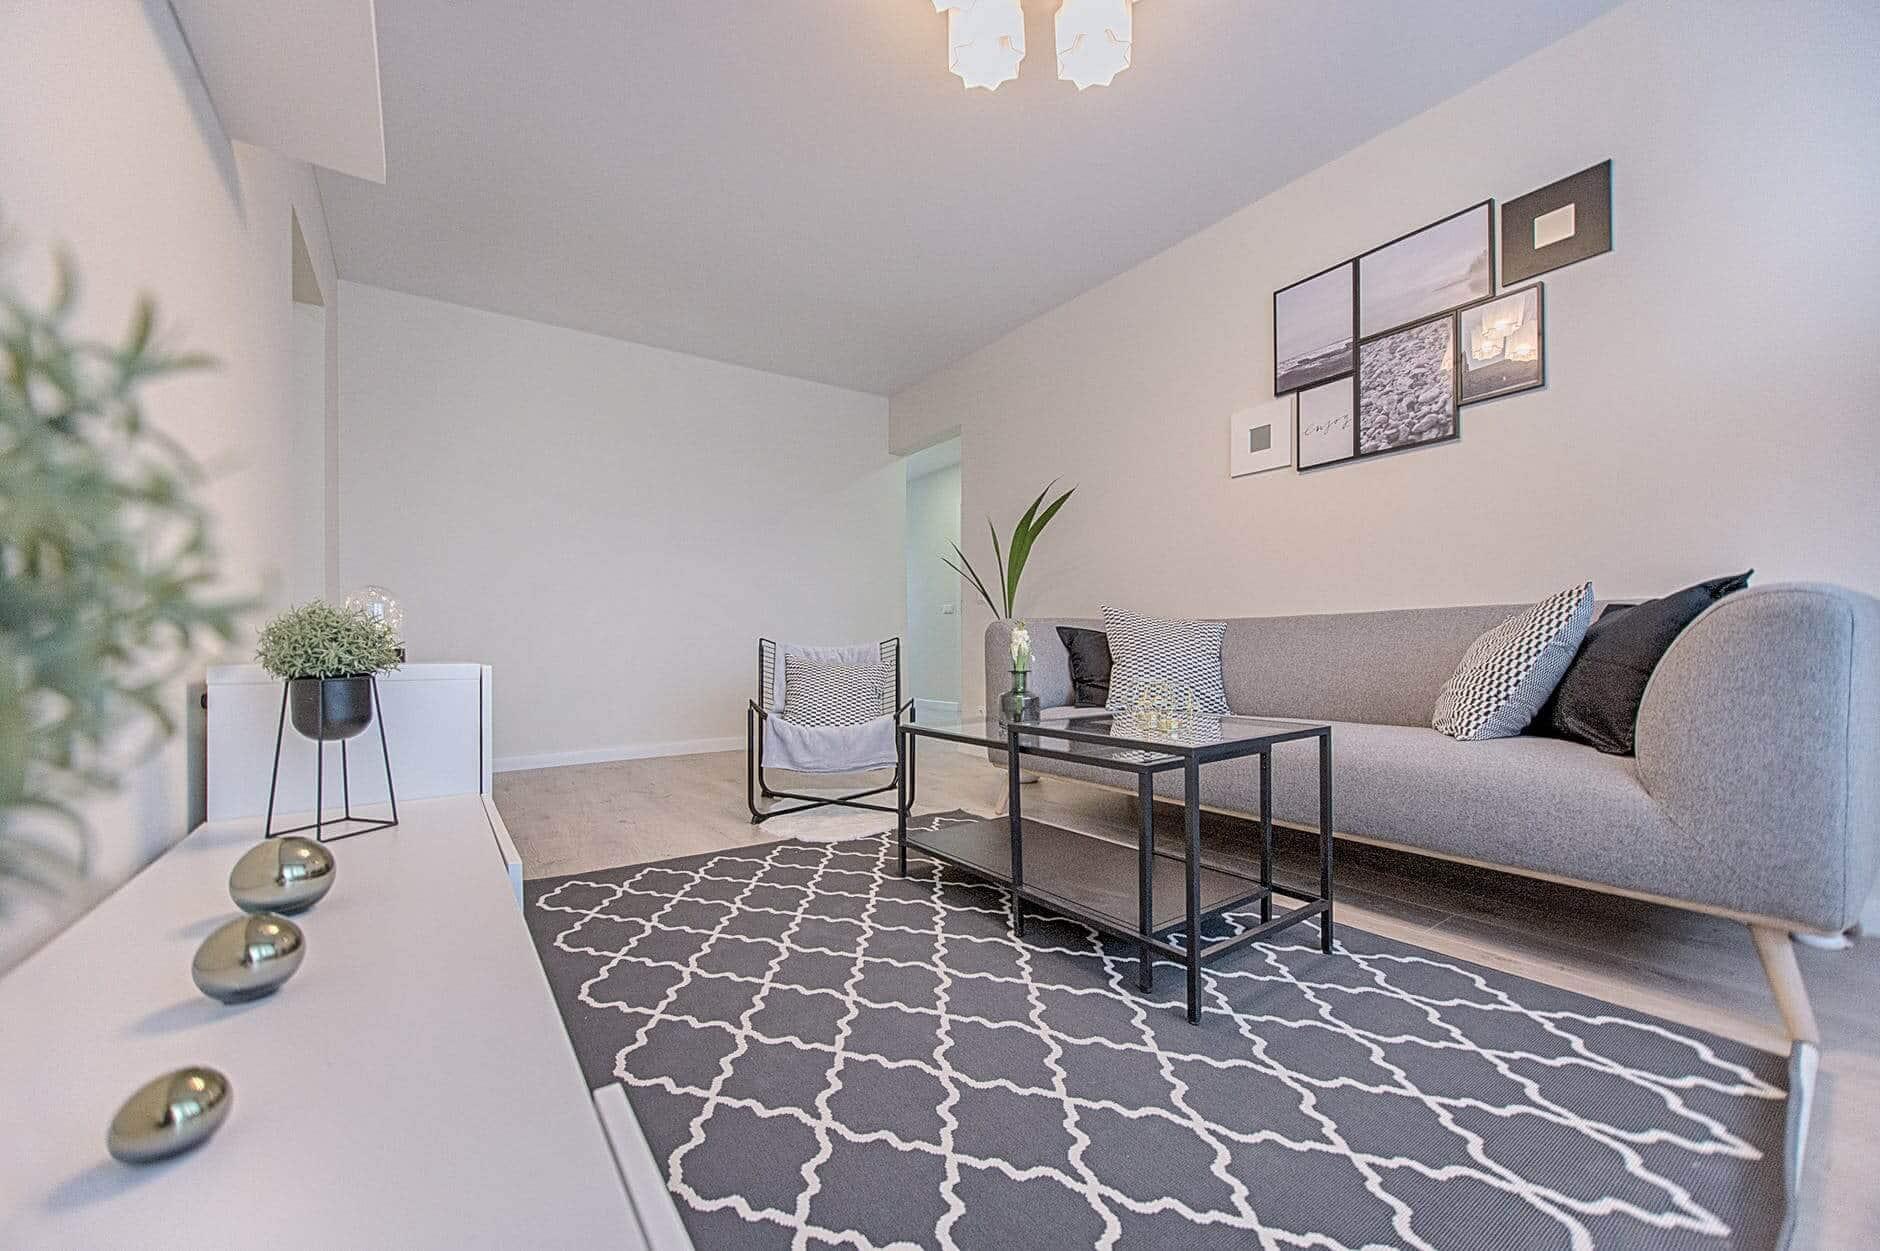 Rug Designs For Living Room 1